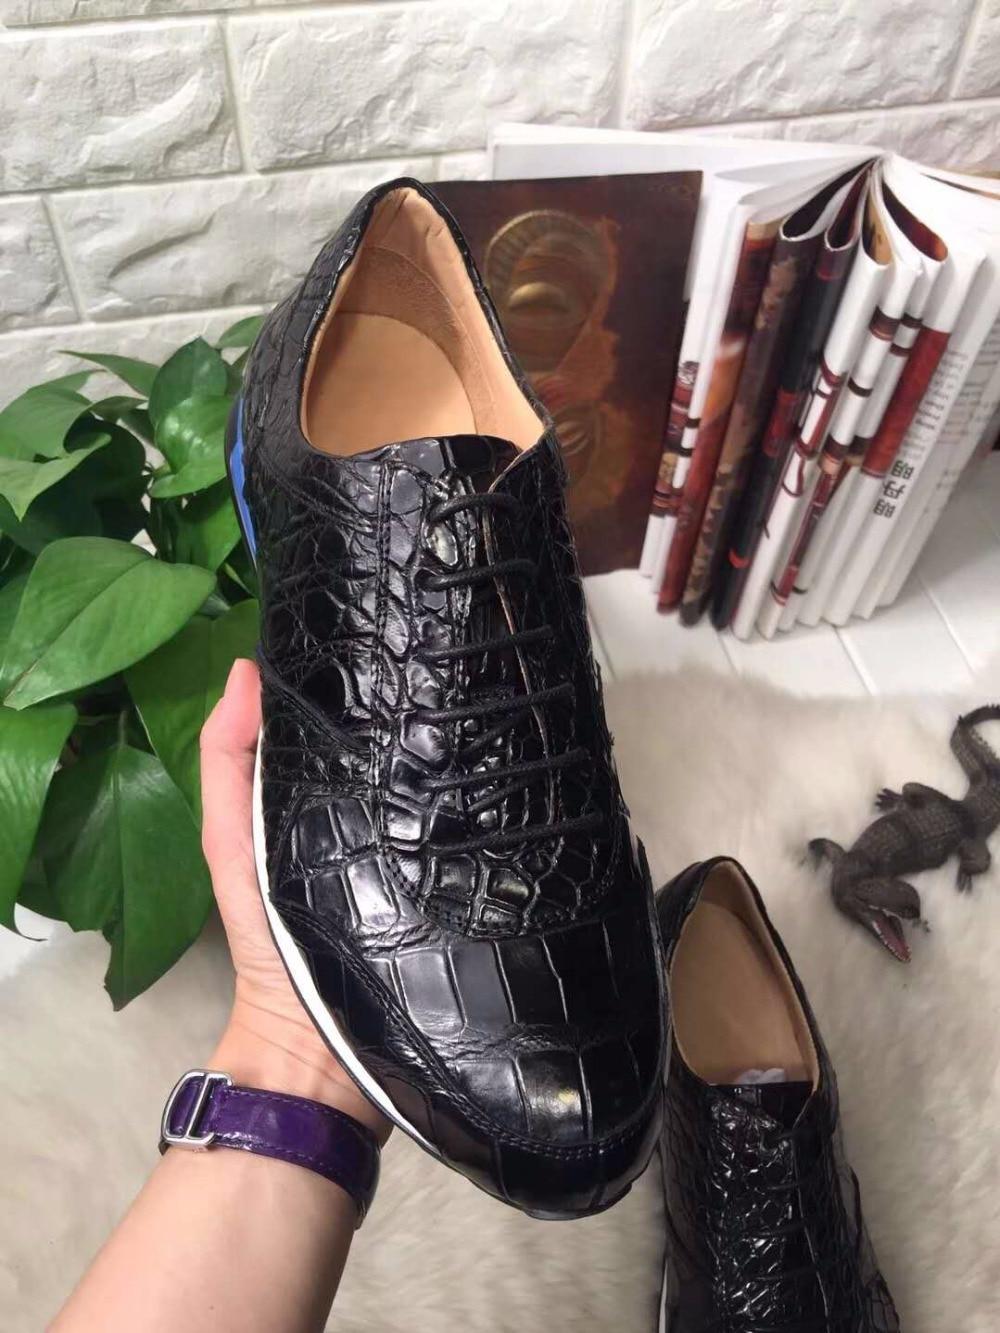 Krokodil 2018 Top Schuh Qualität Echte Schuh Freizeit Mode Reale Bauchhaut Farbe Schwarz Krokodilleder Männer Echtes wgtgq0r